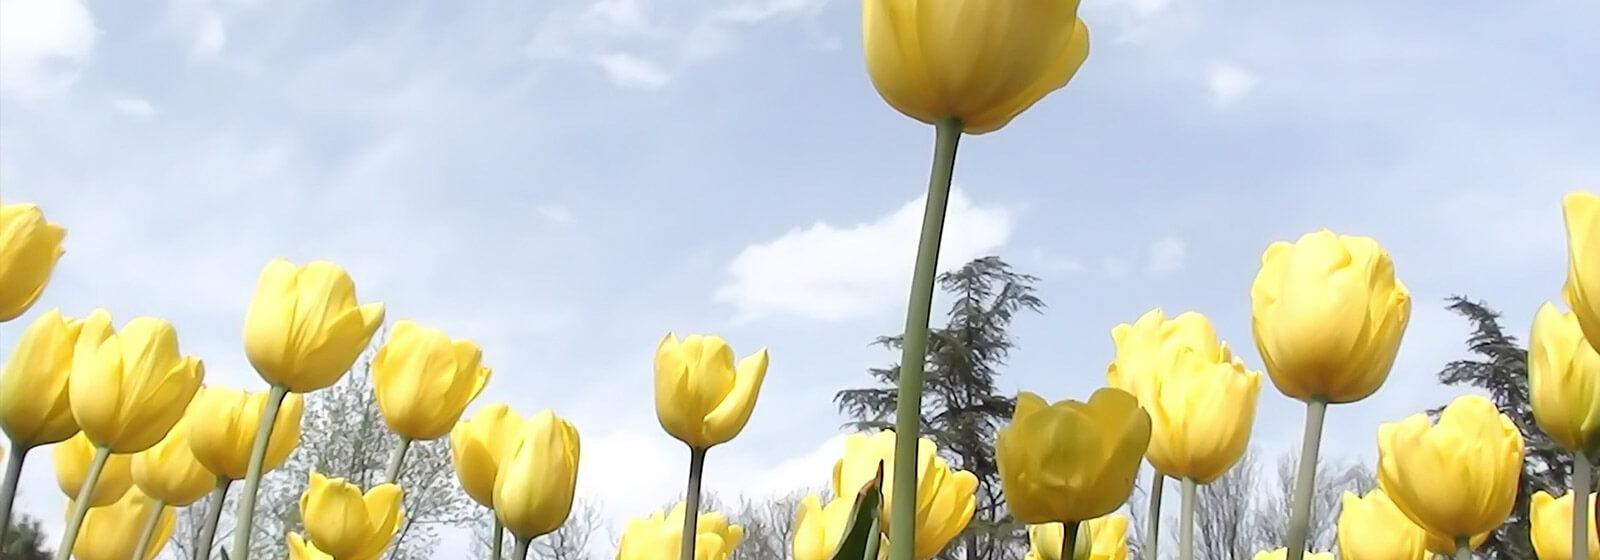 Tulips image slide